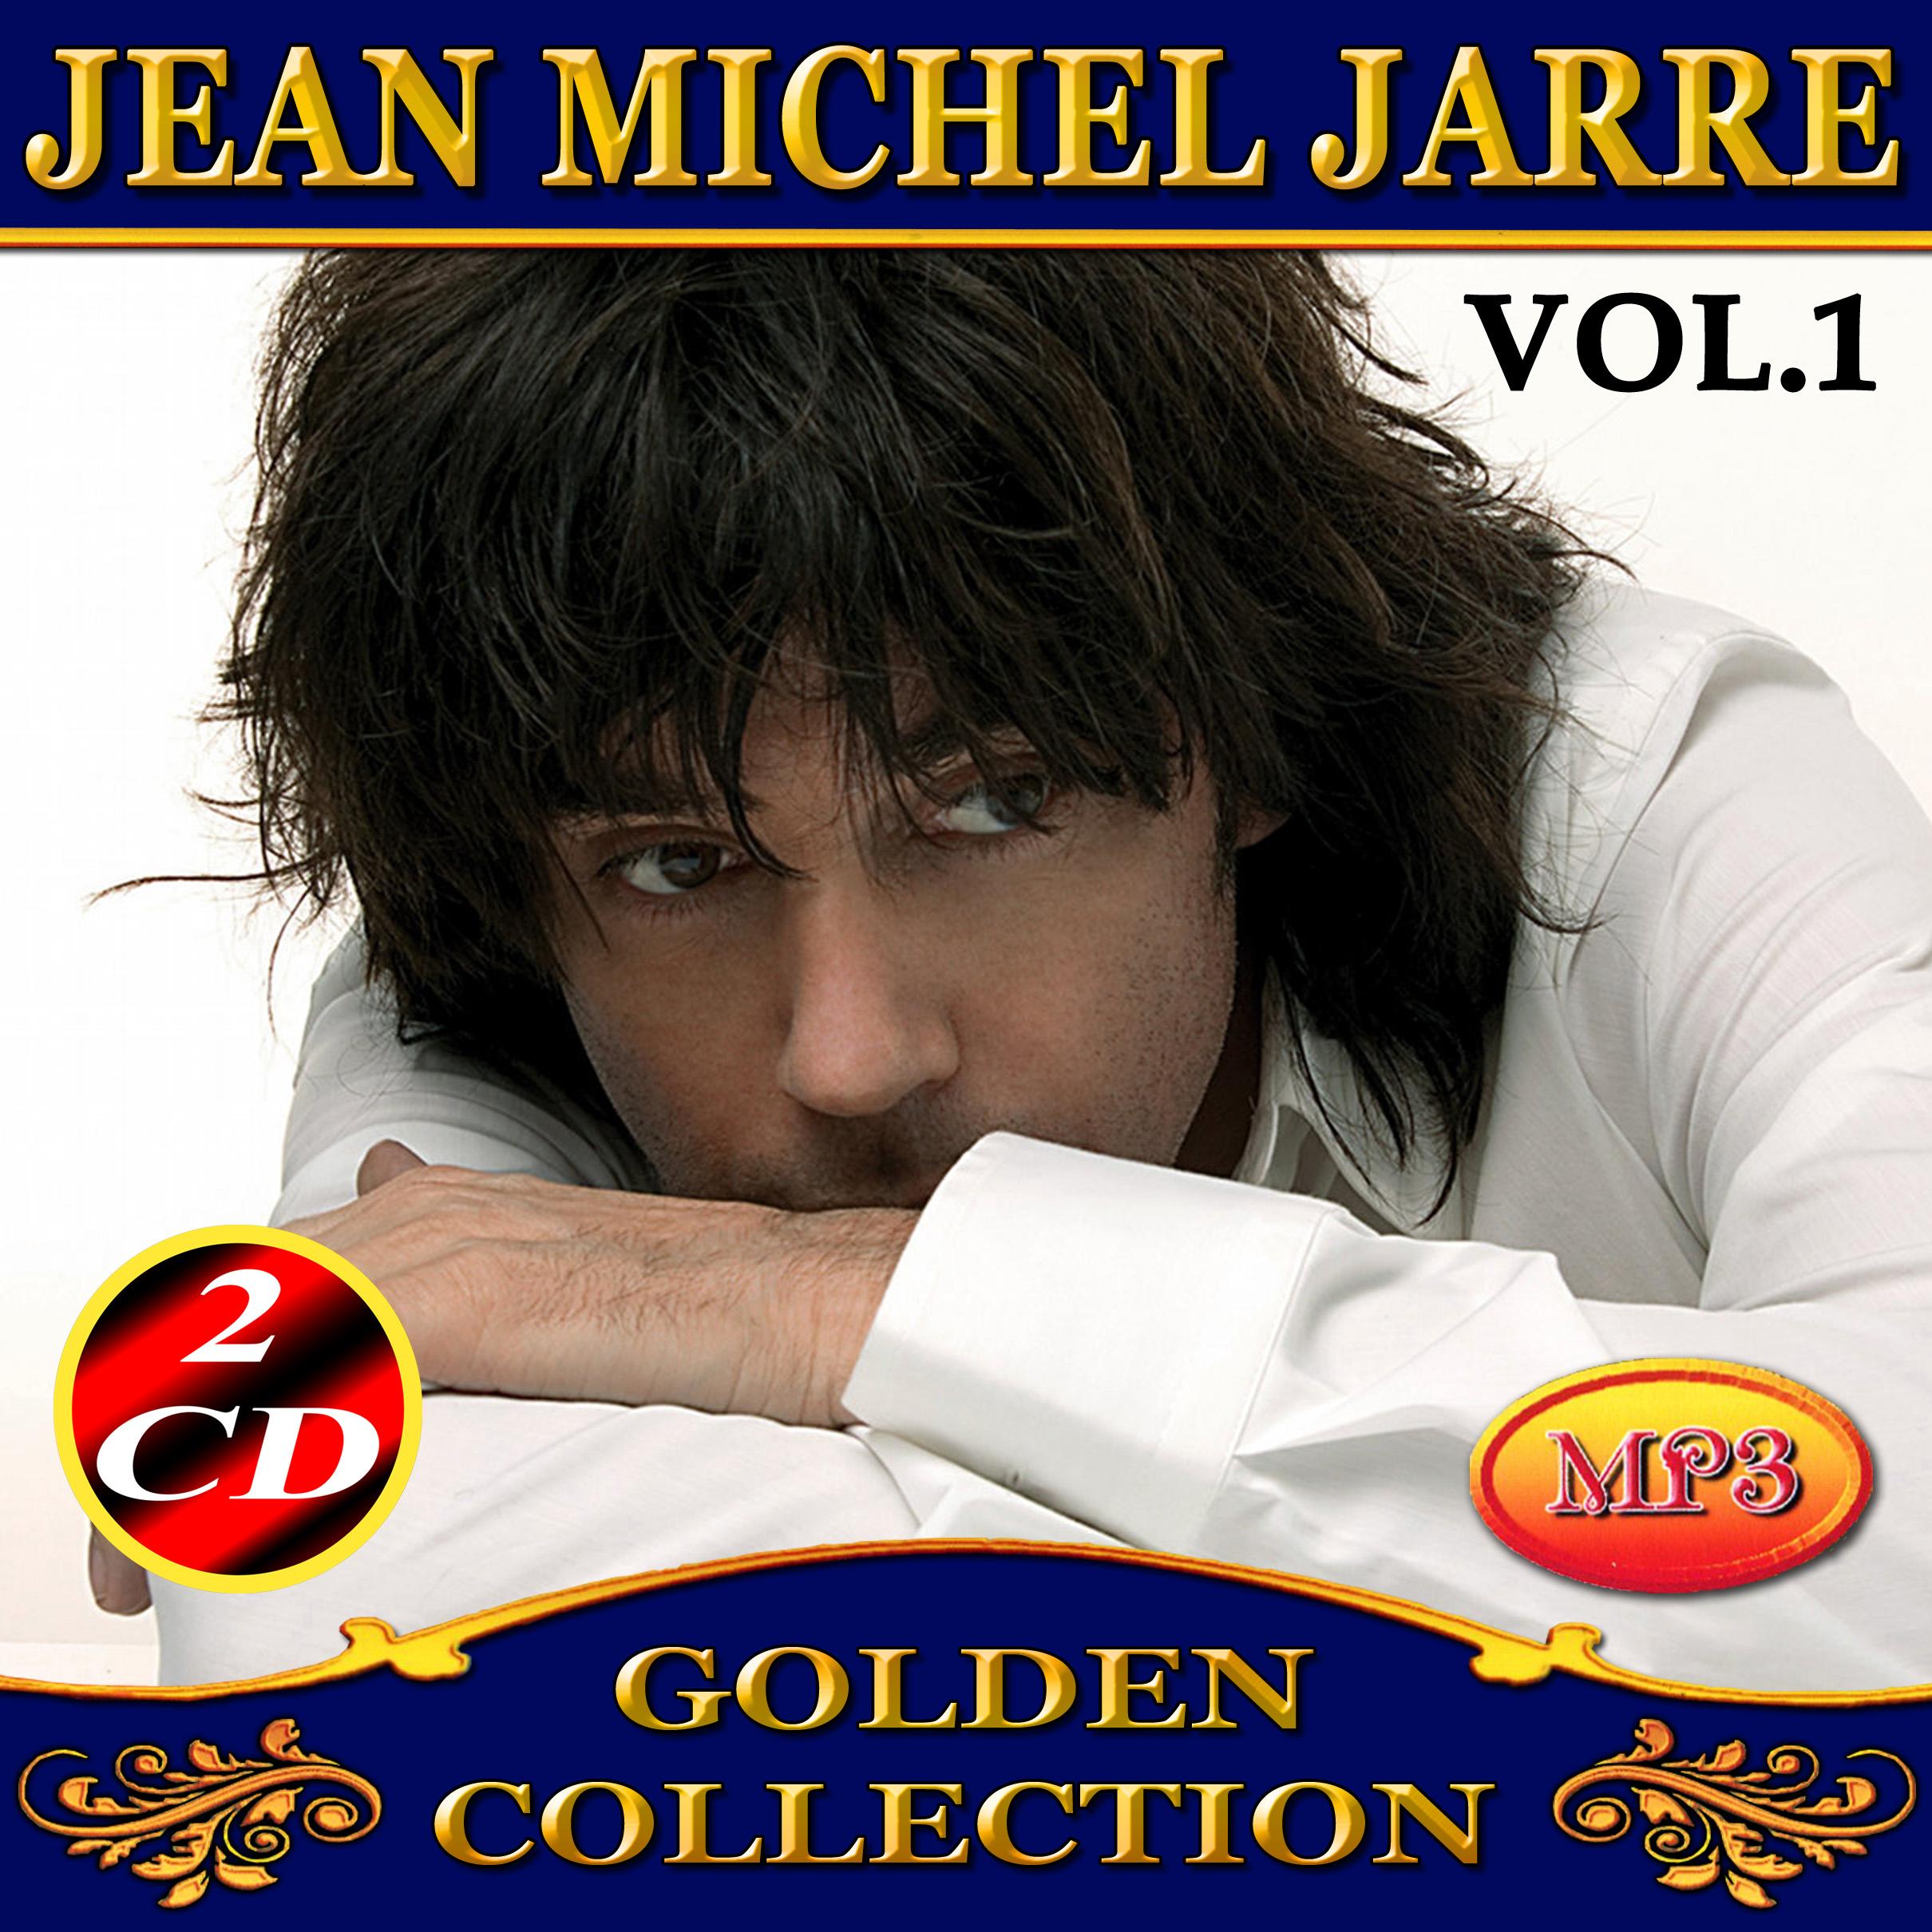 Jean Michel Jarre 1ч2cd [mp3]